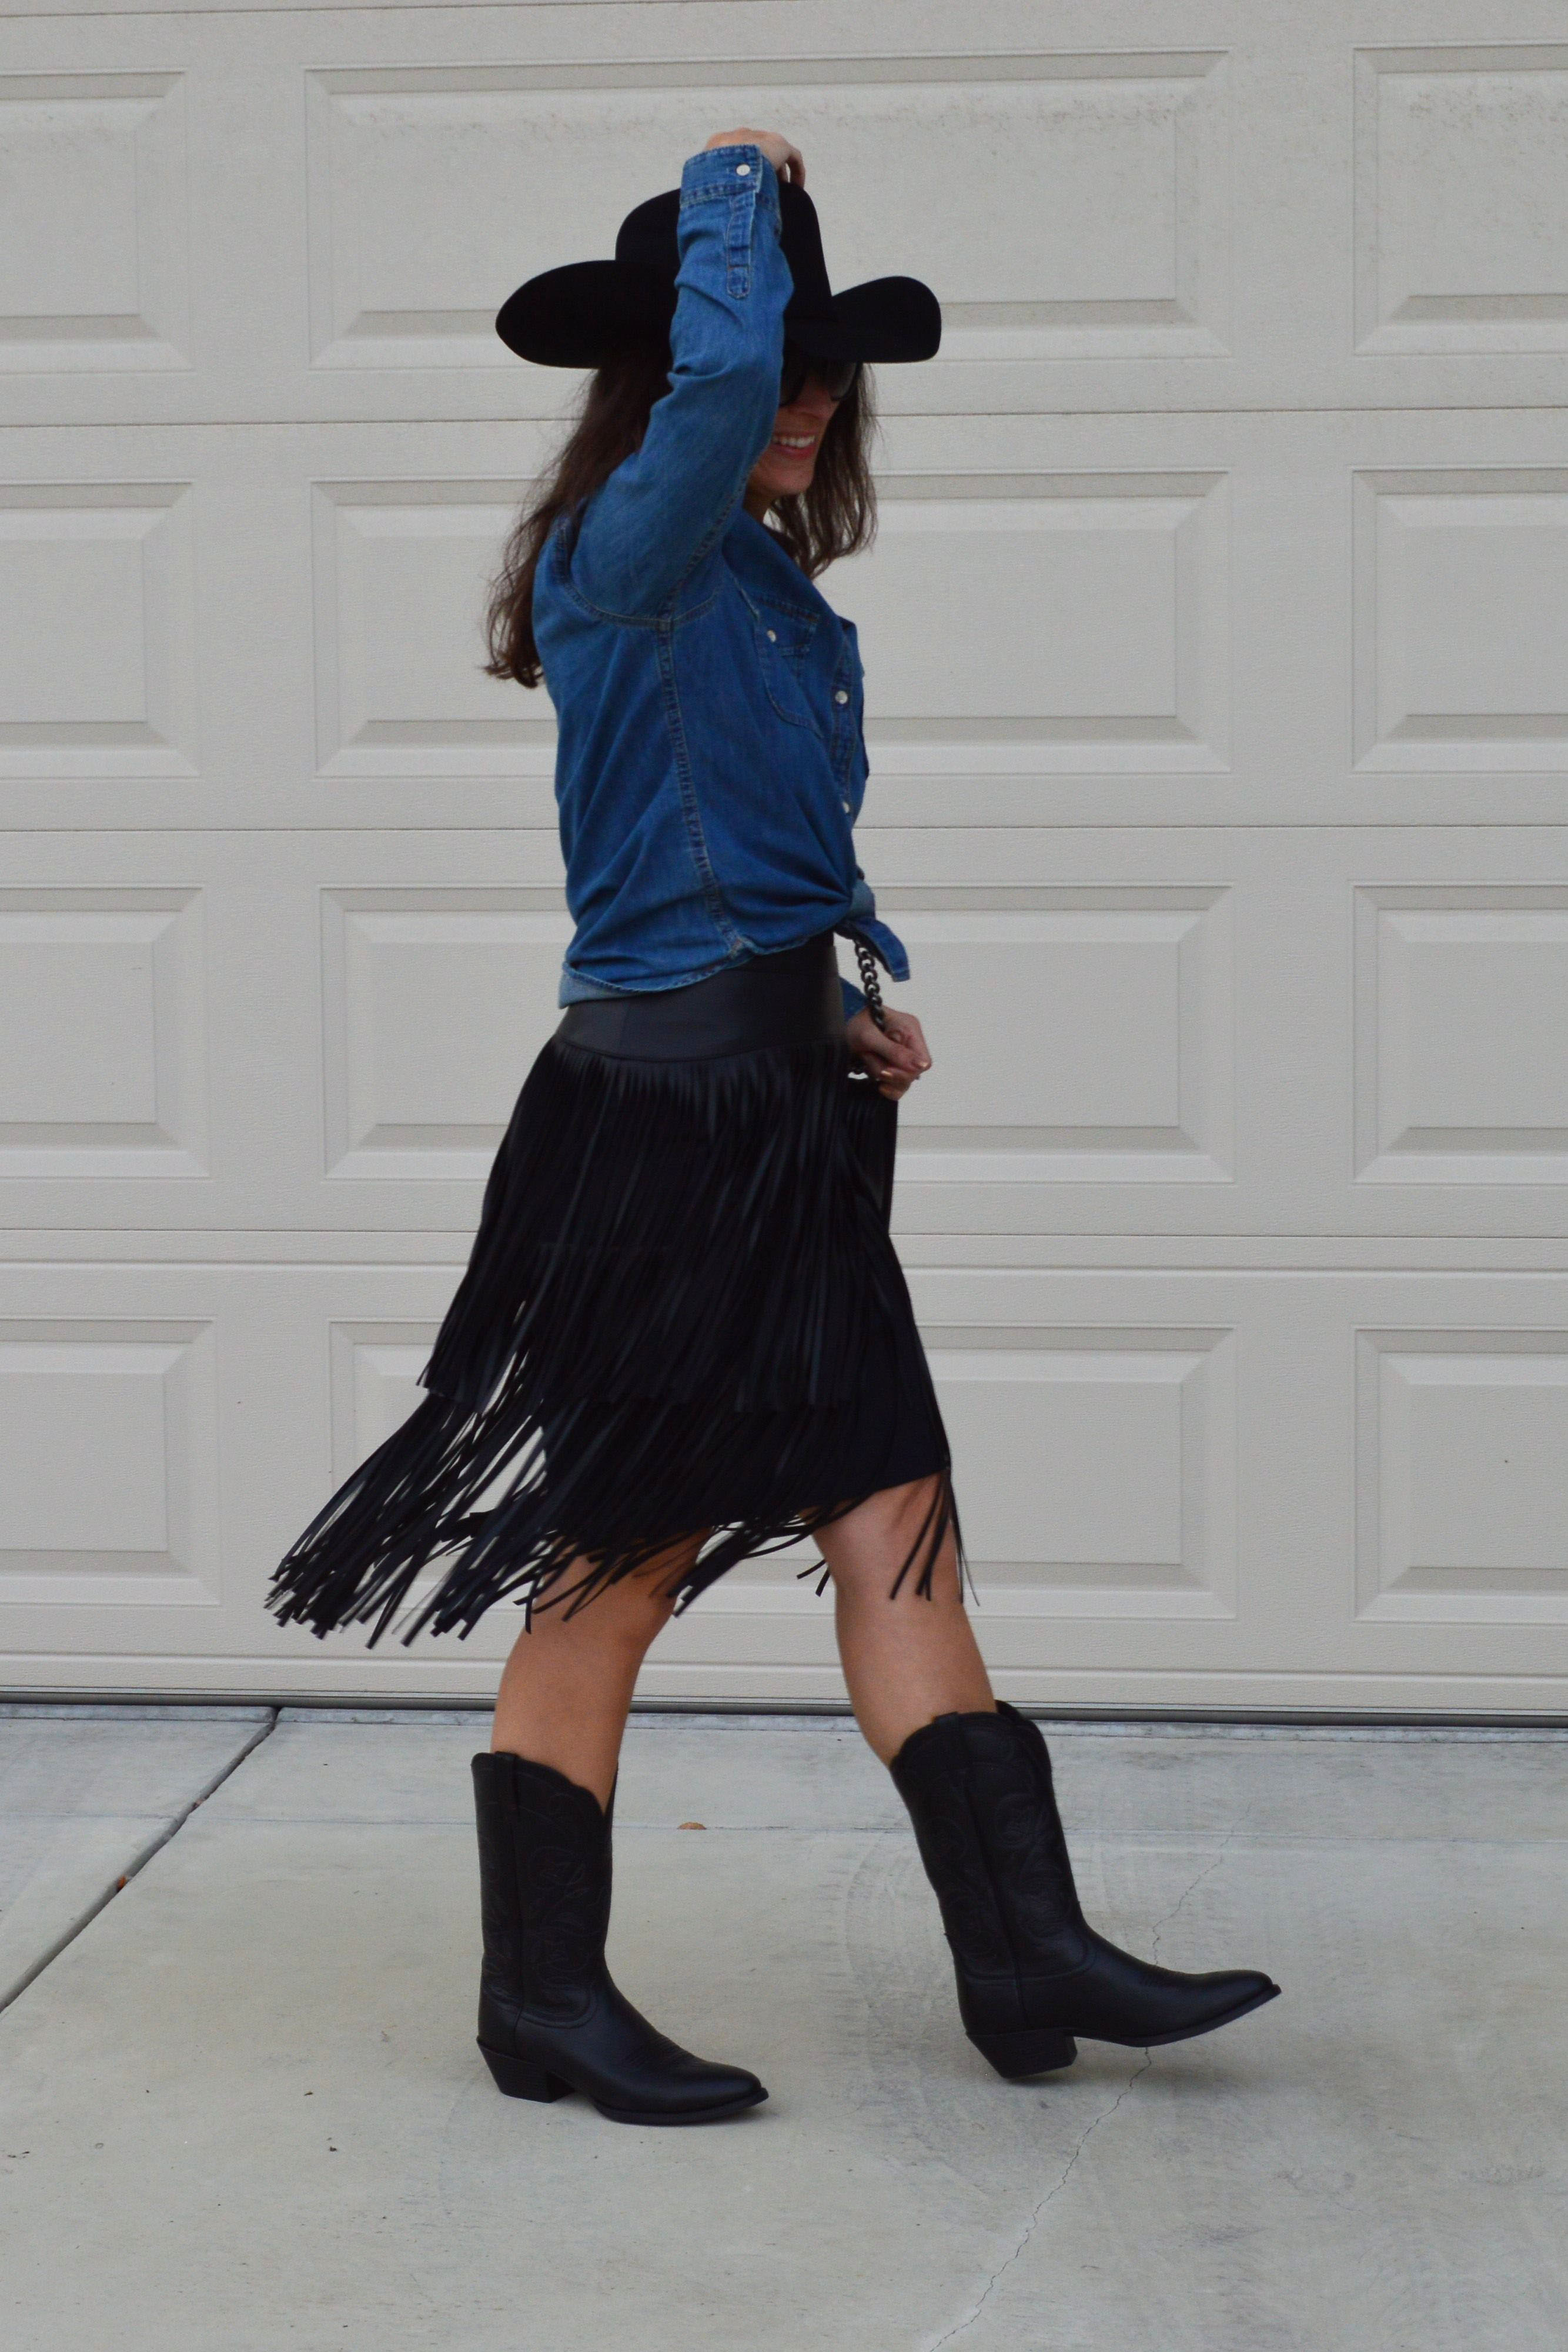 western fringe outfit cowgirl costume idea & western fringe outfit cowgirl costume idea u2013 Bay Area Fashionista